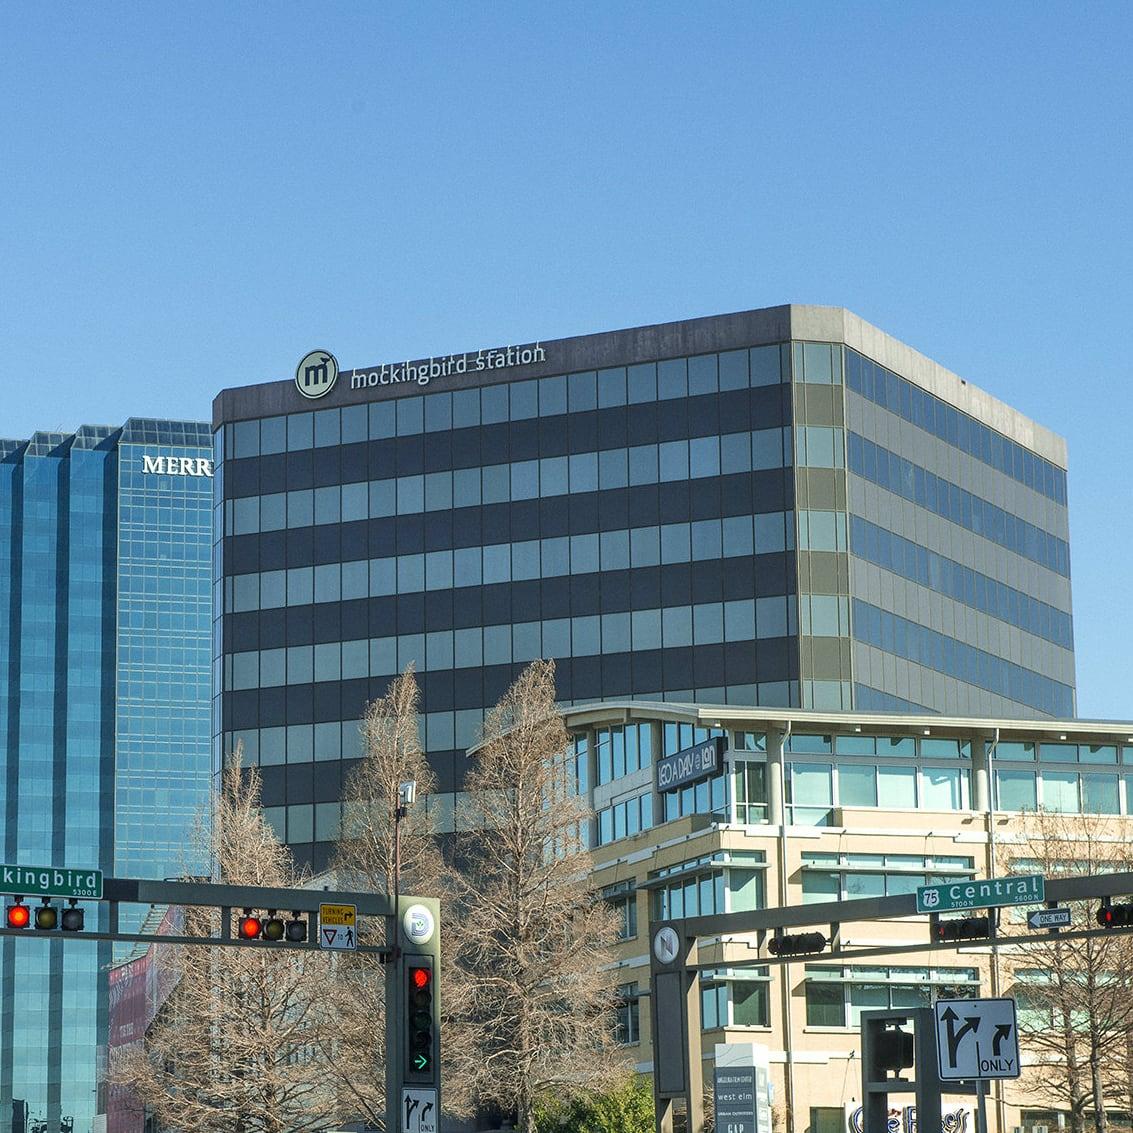 Mockingbird Station in Dallas